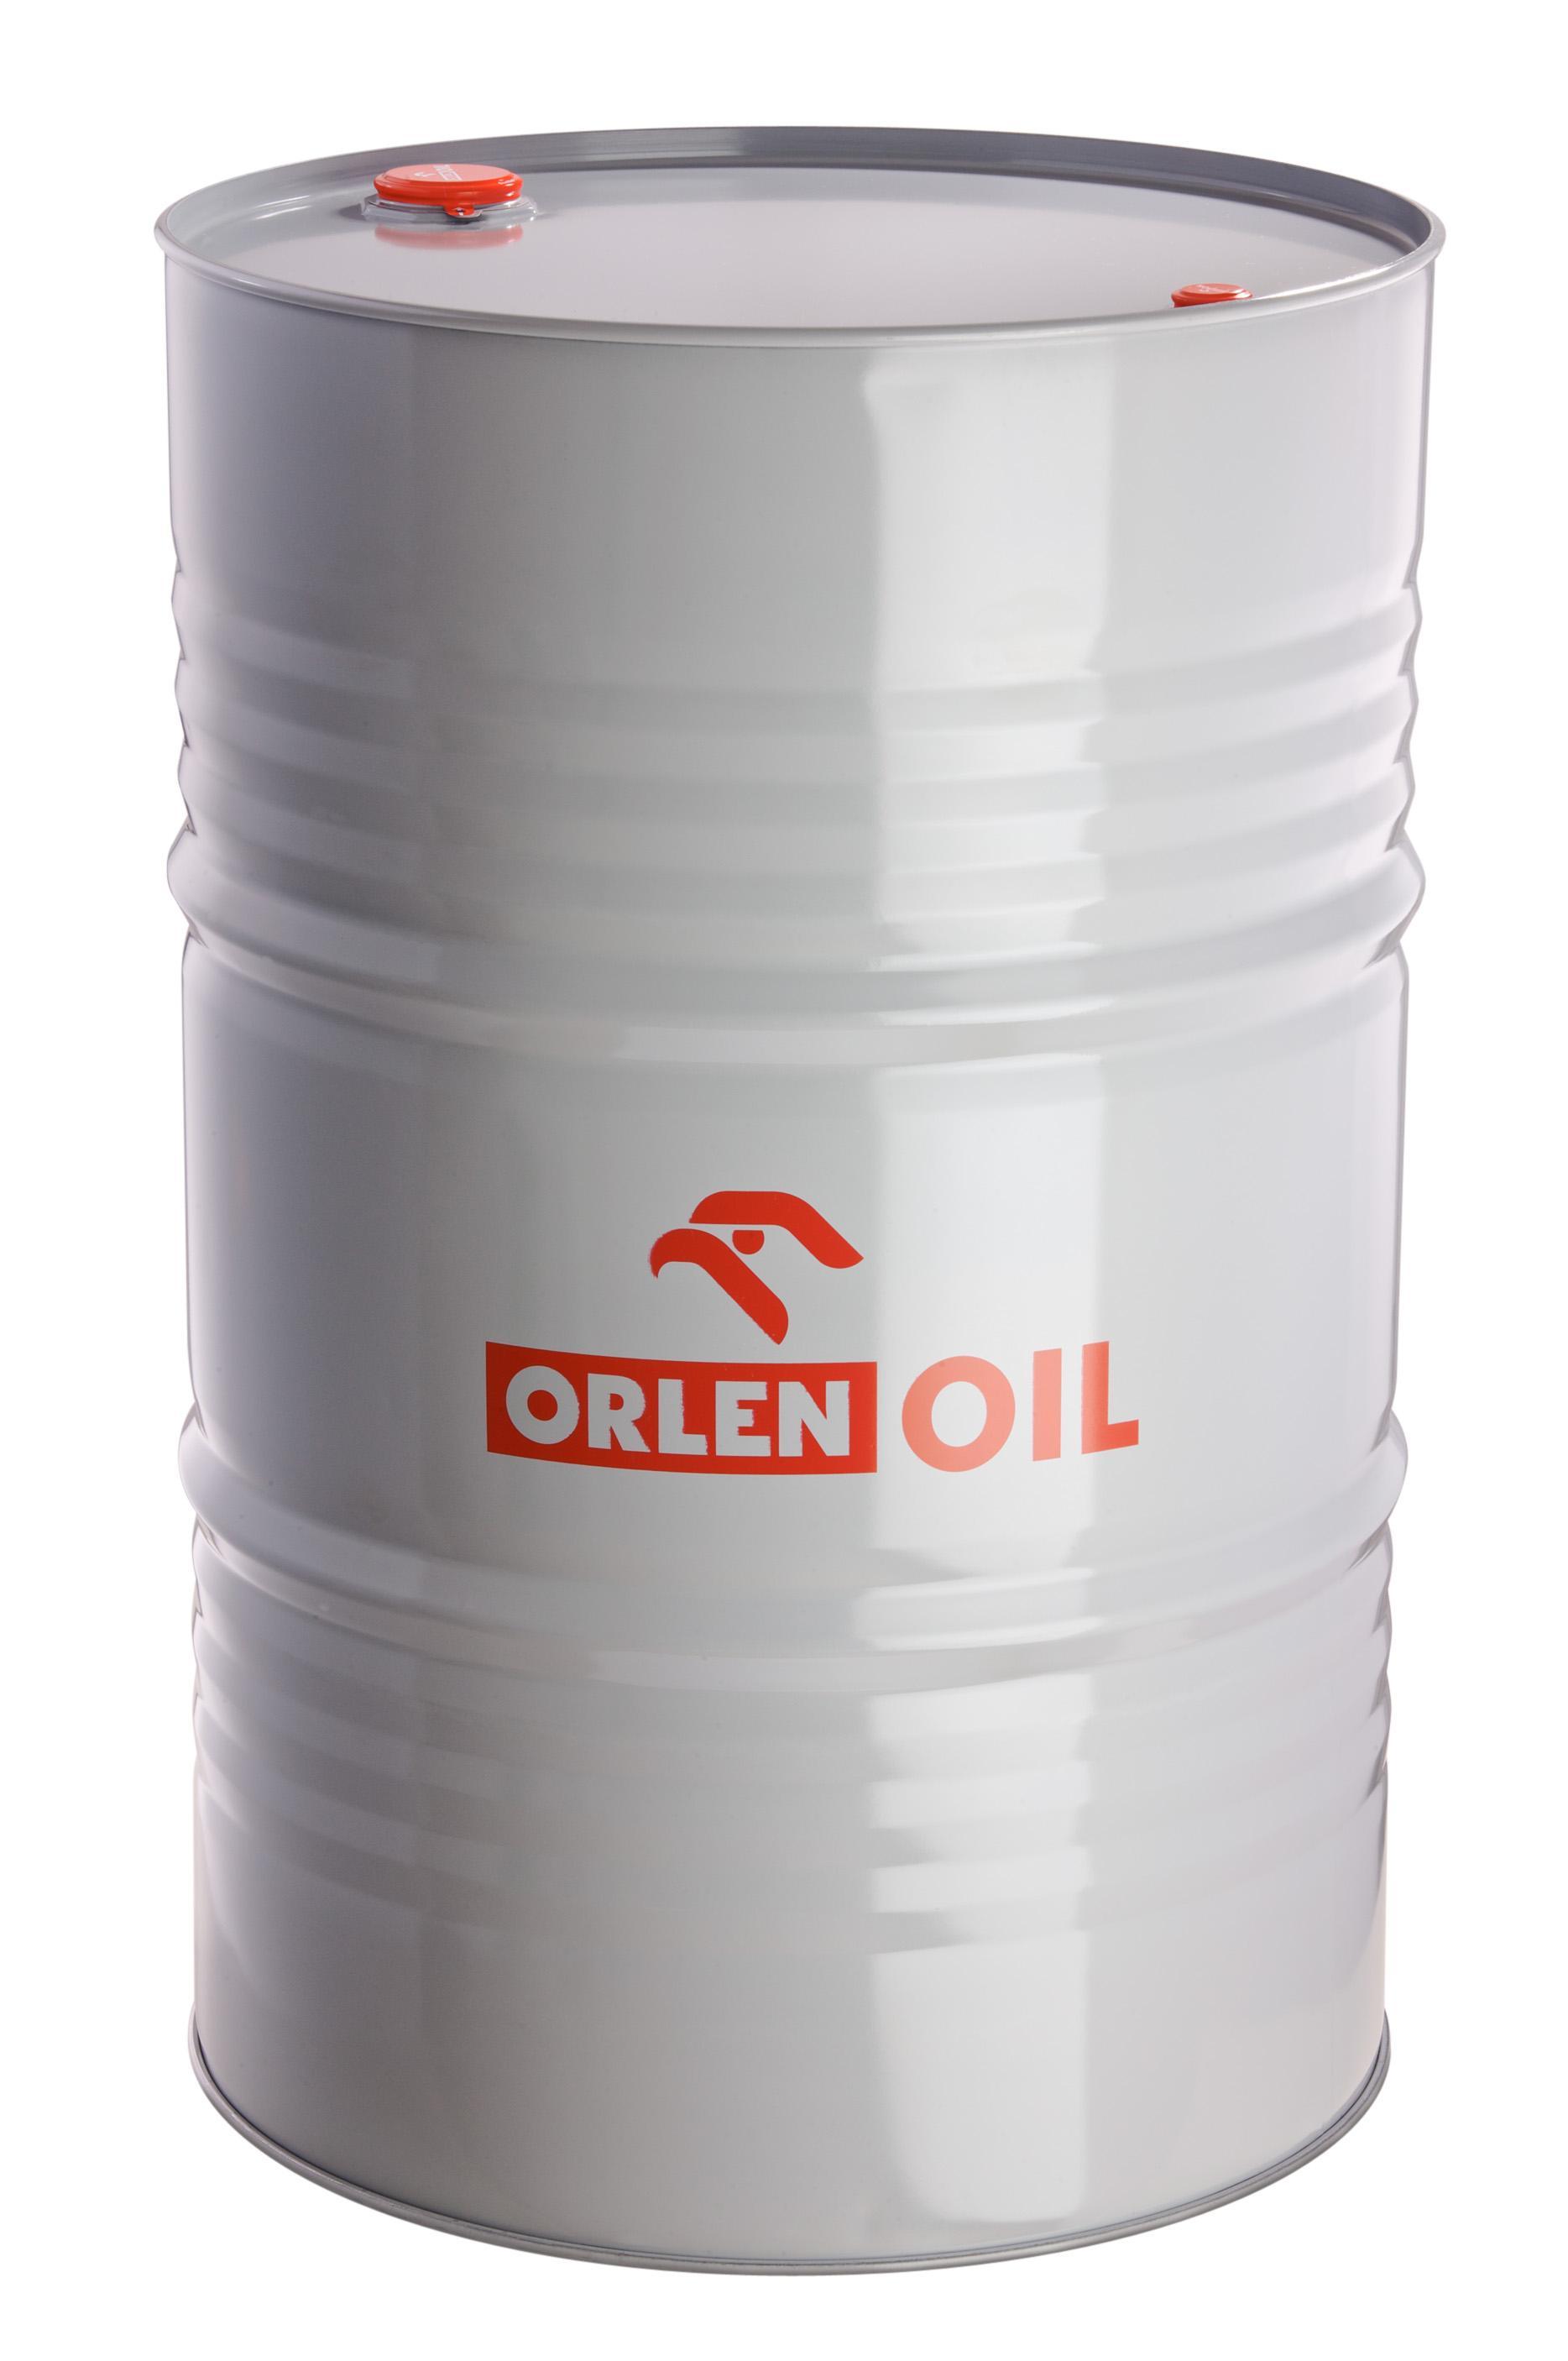 ORLEN OIL OLEJ DO OBRÓBKI METALI SM    BECZKA 205L **